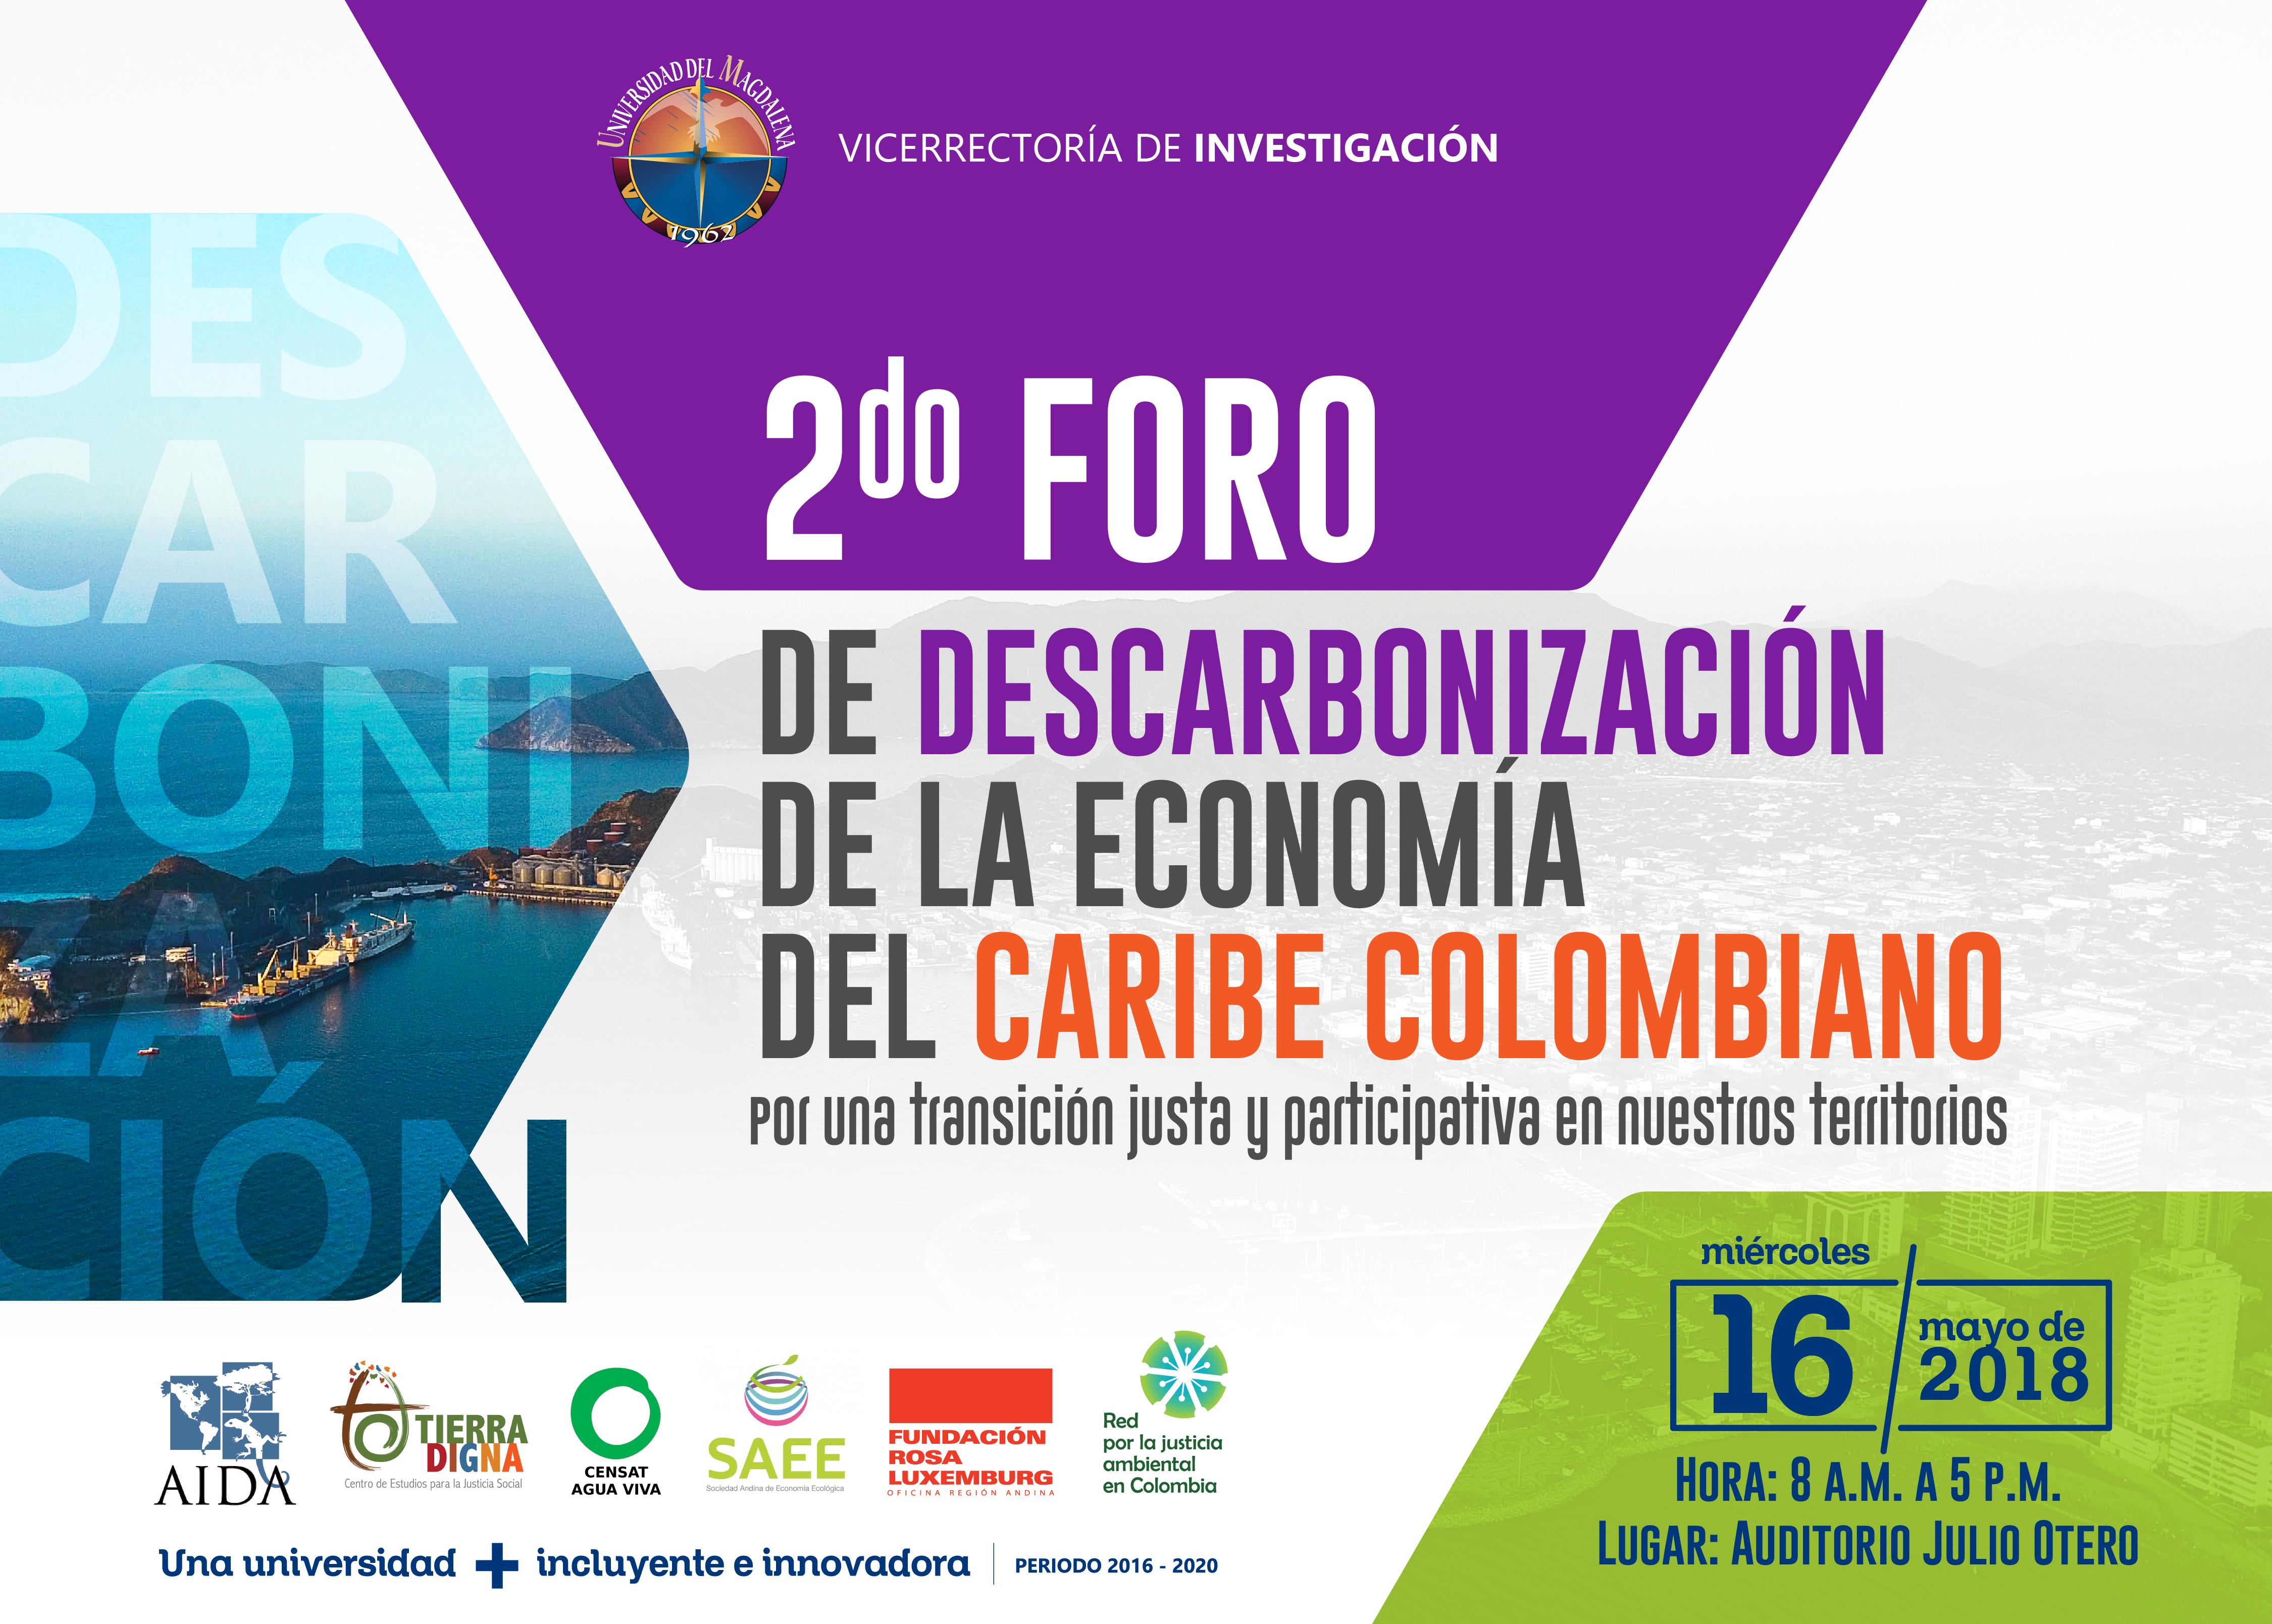 2do_foro_descarbonizaci_n-01